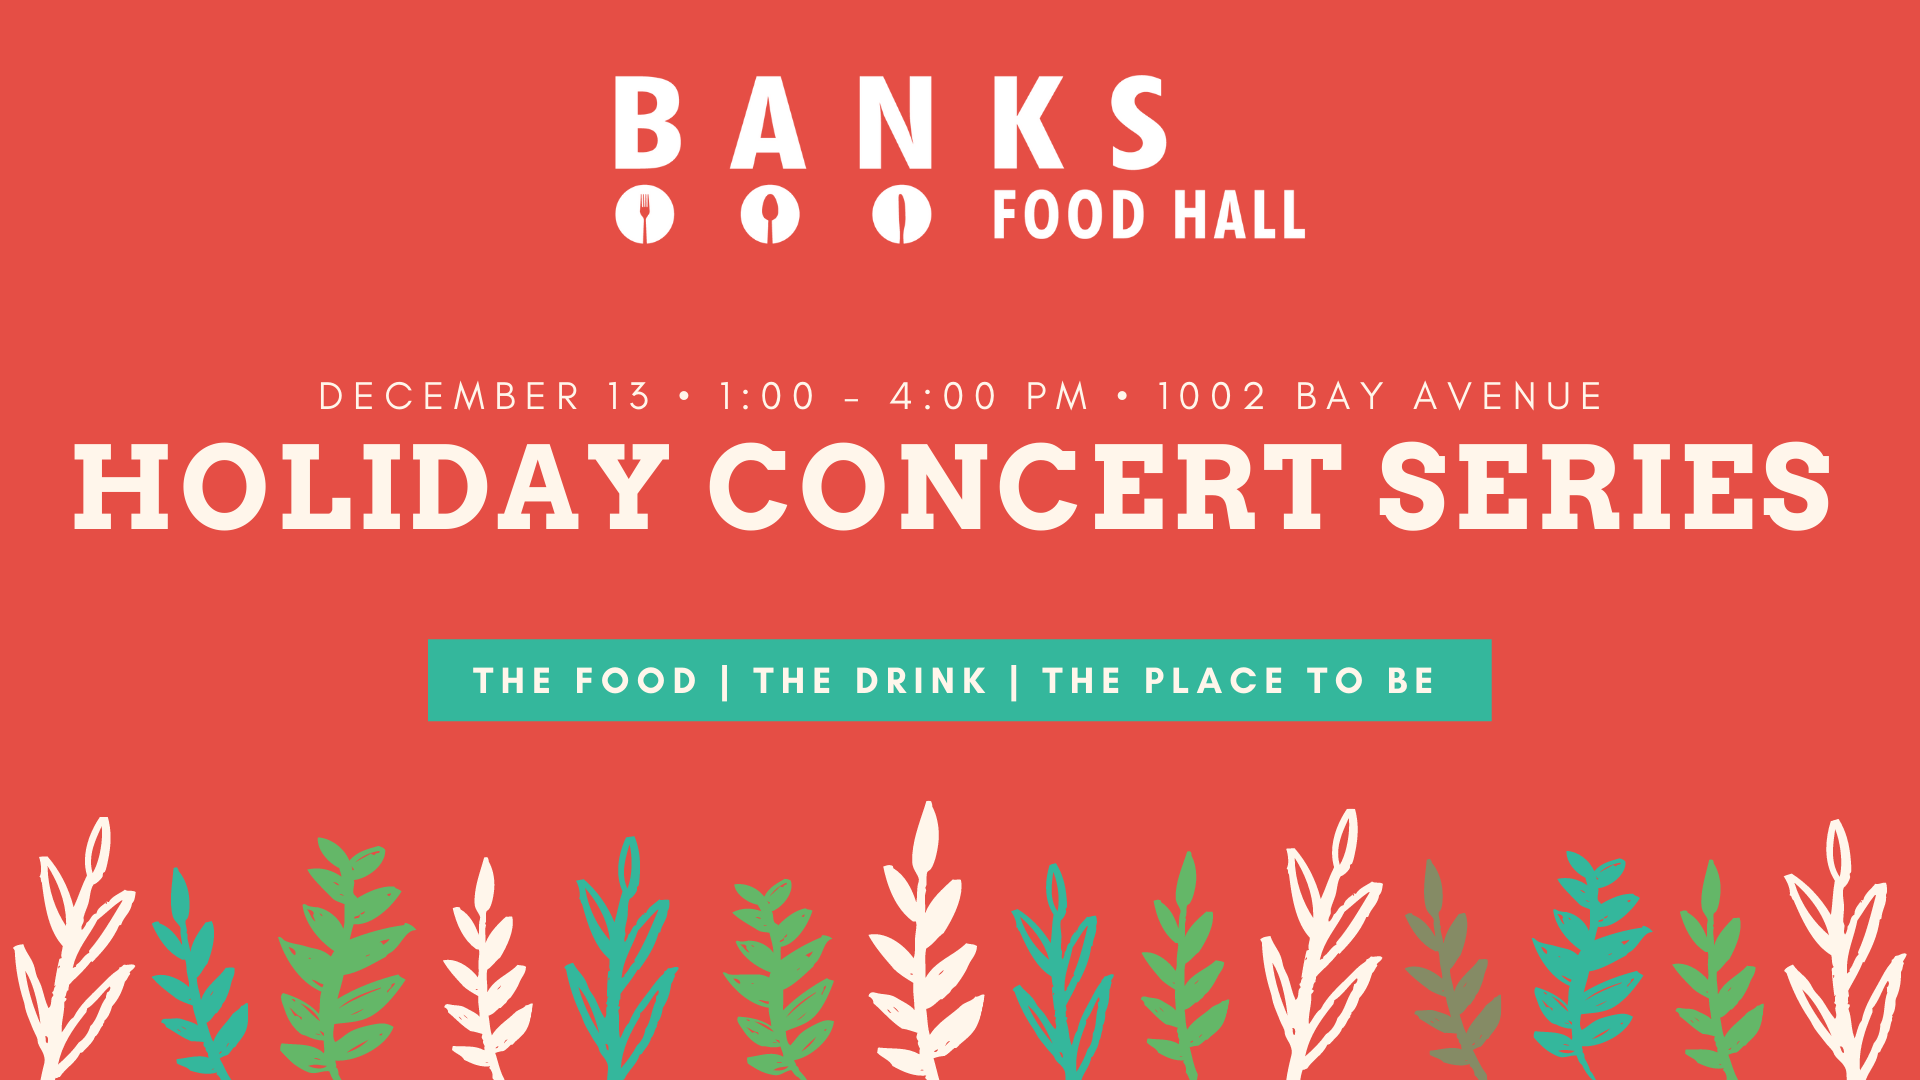 BANKS Holiday Concert Series